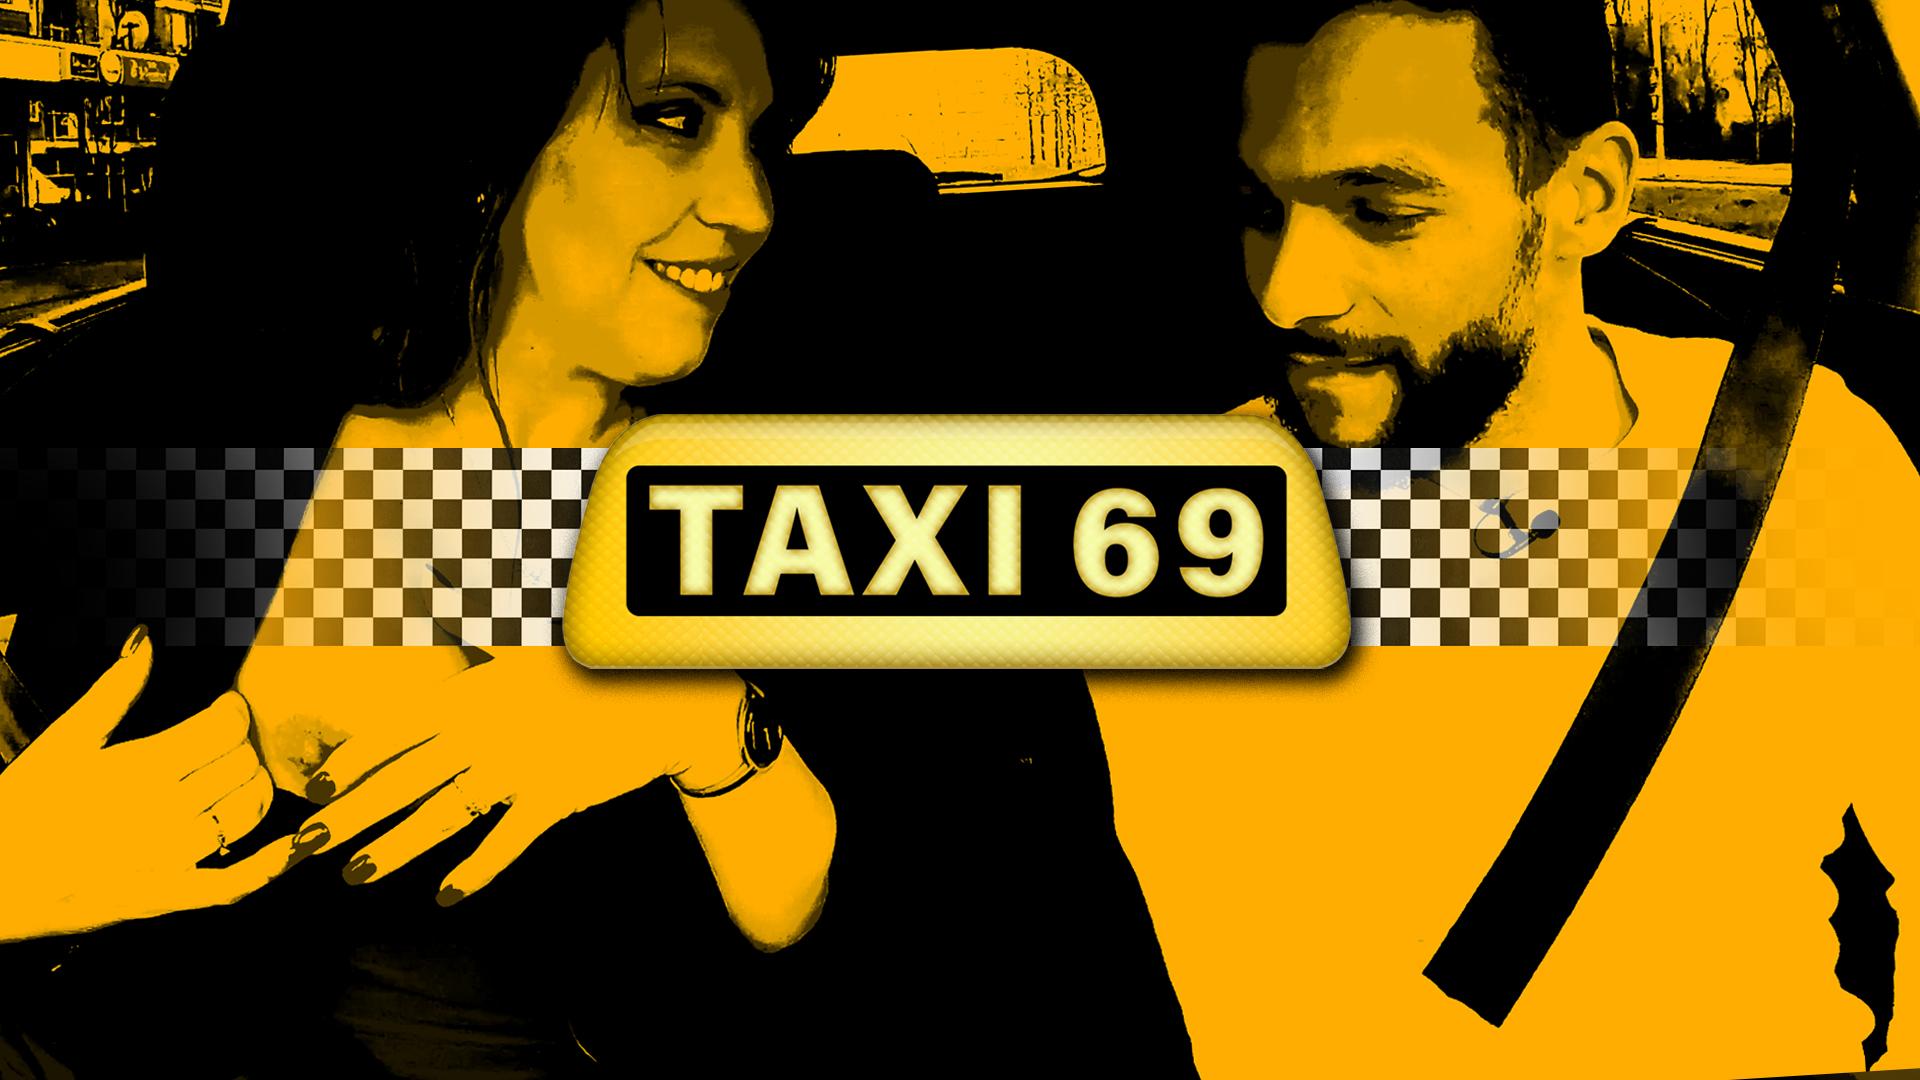 Geile foto van de hete Secret Circle seksfilm: Taxi 69